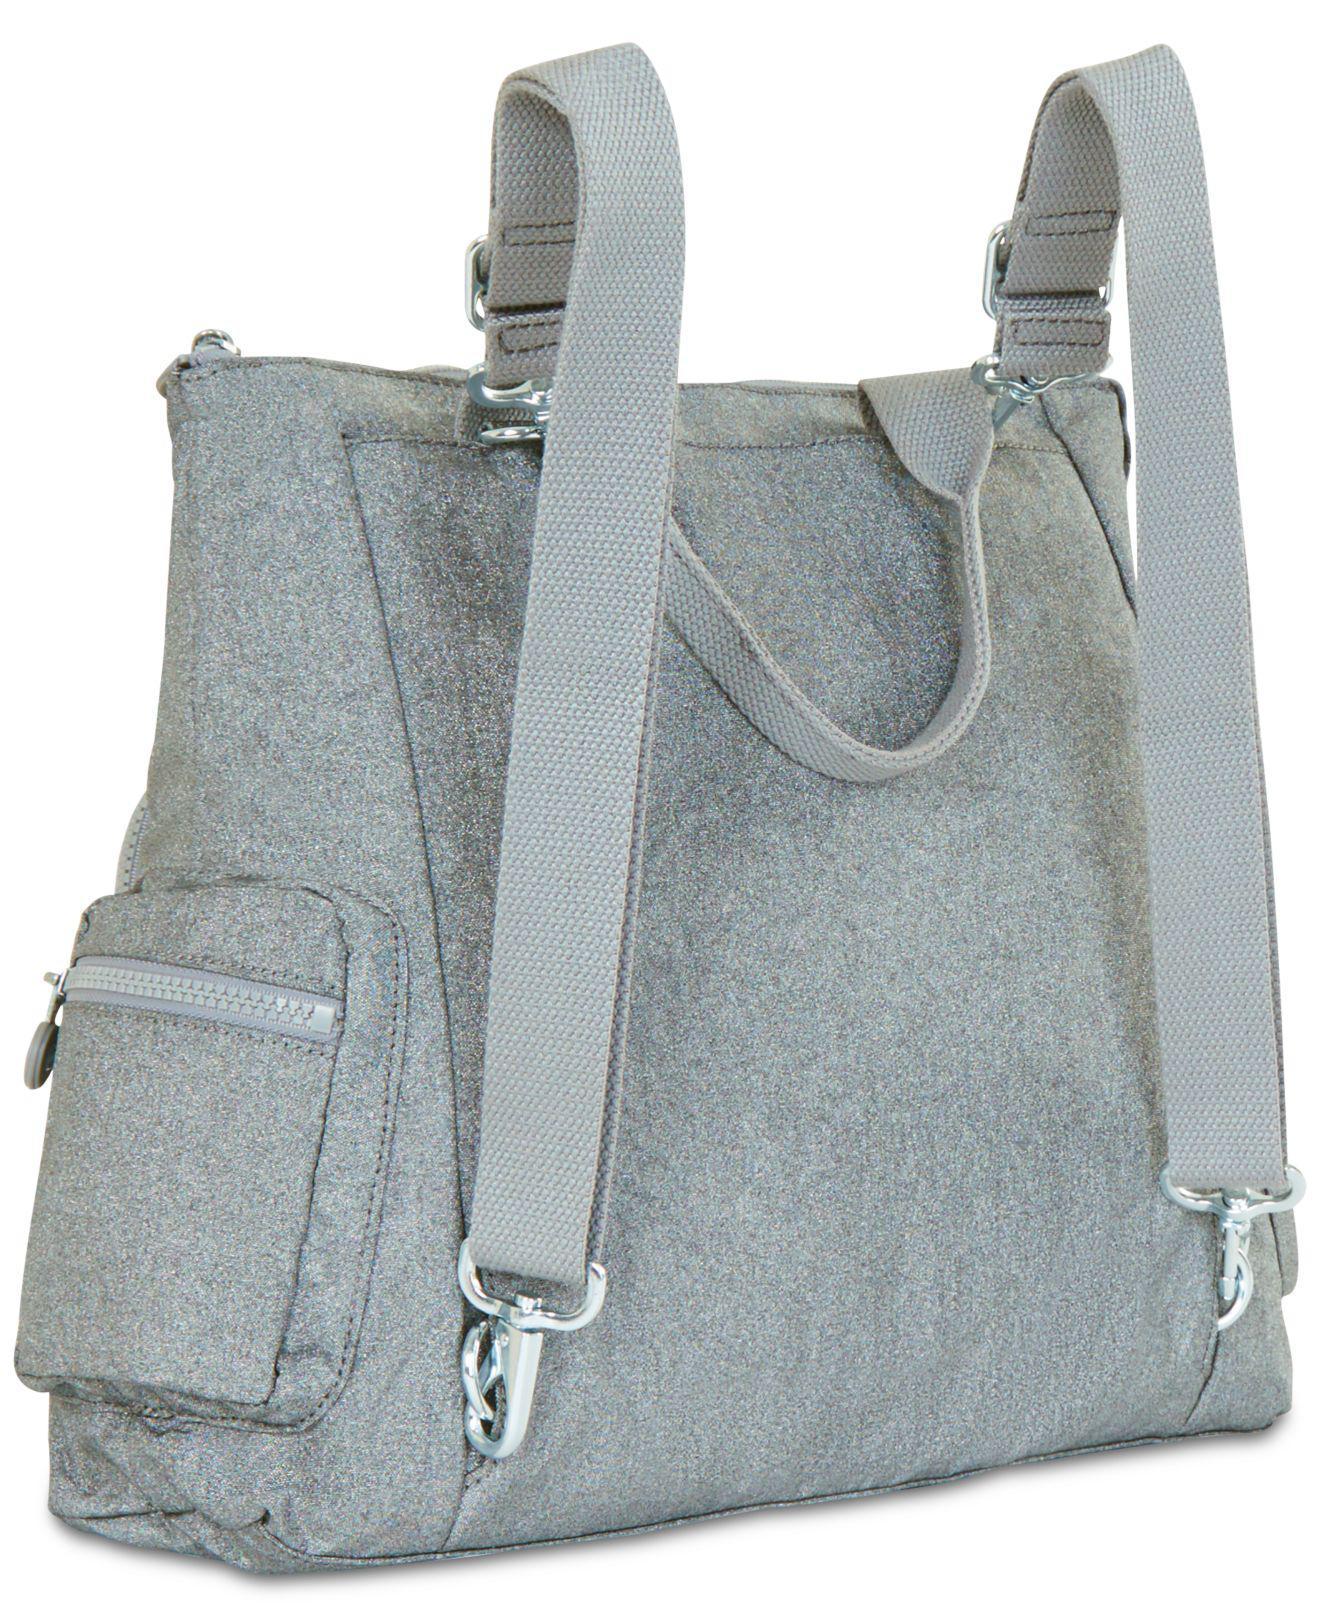 5867bb6d4d06 Lyst - Kipling Alvy 2-in-1 Convertible Tote Bag Backpack in Metallic